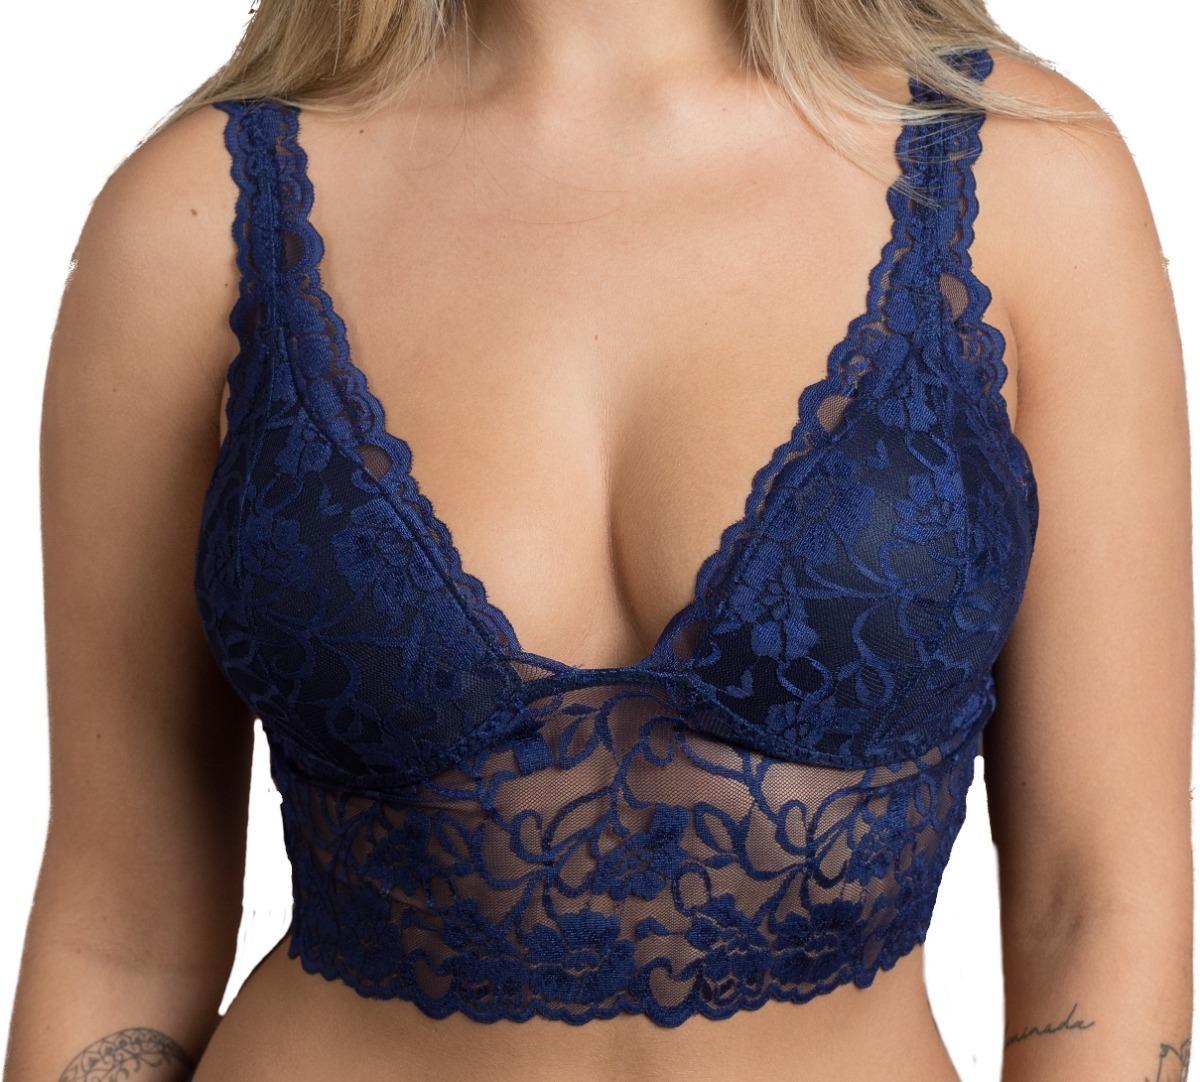 a07cd863c ... top cropped renda sutiã cropped lingerie. Carregando zoom.